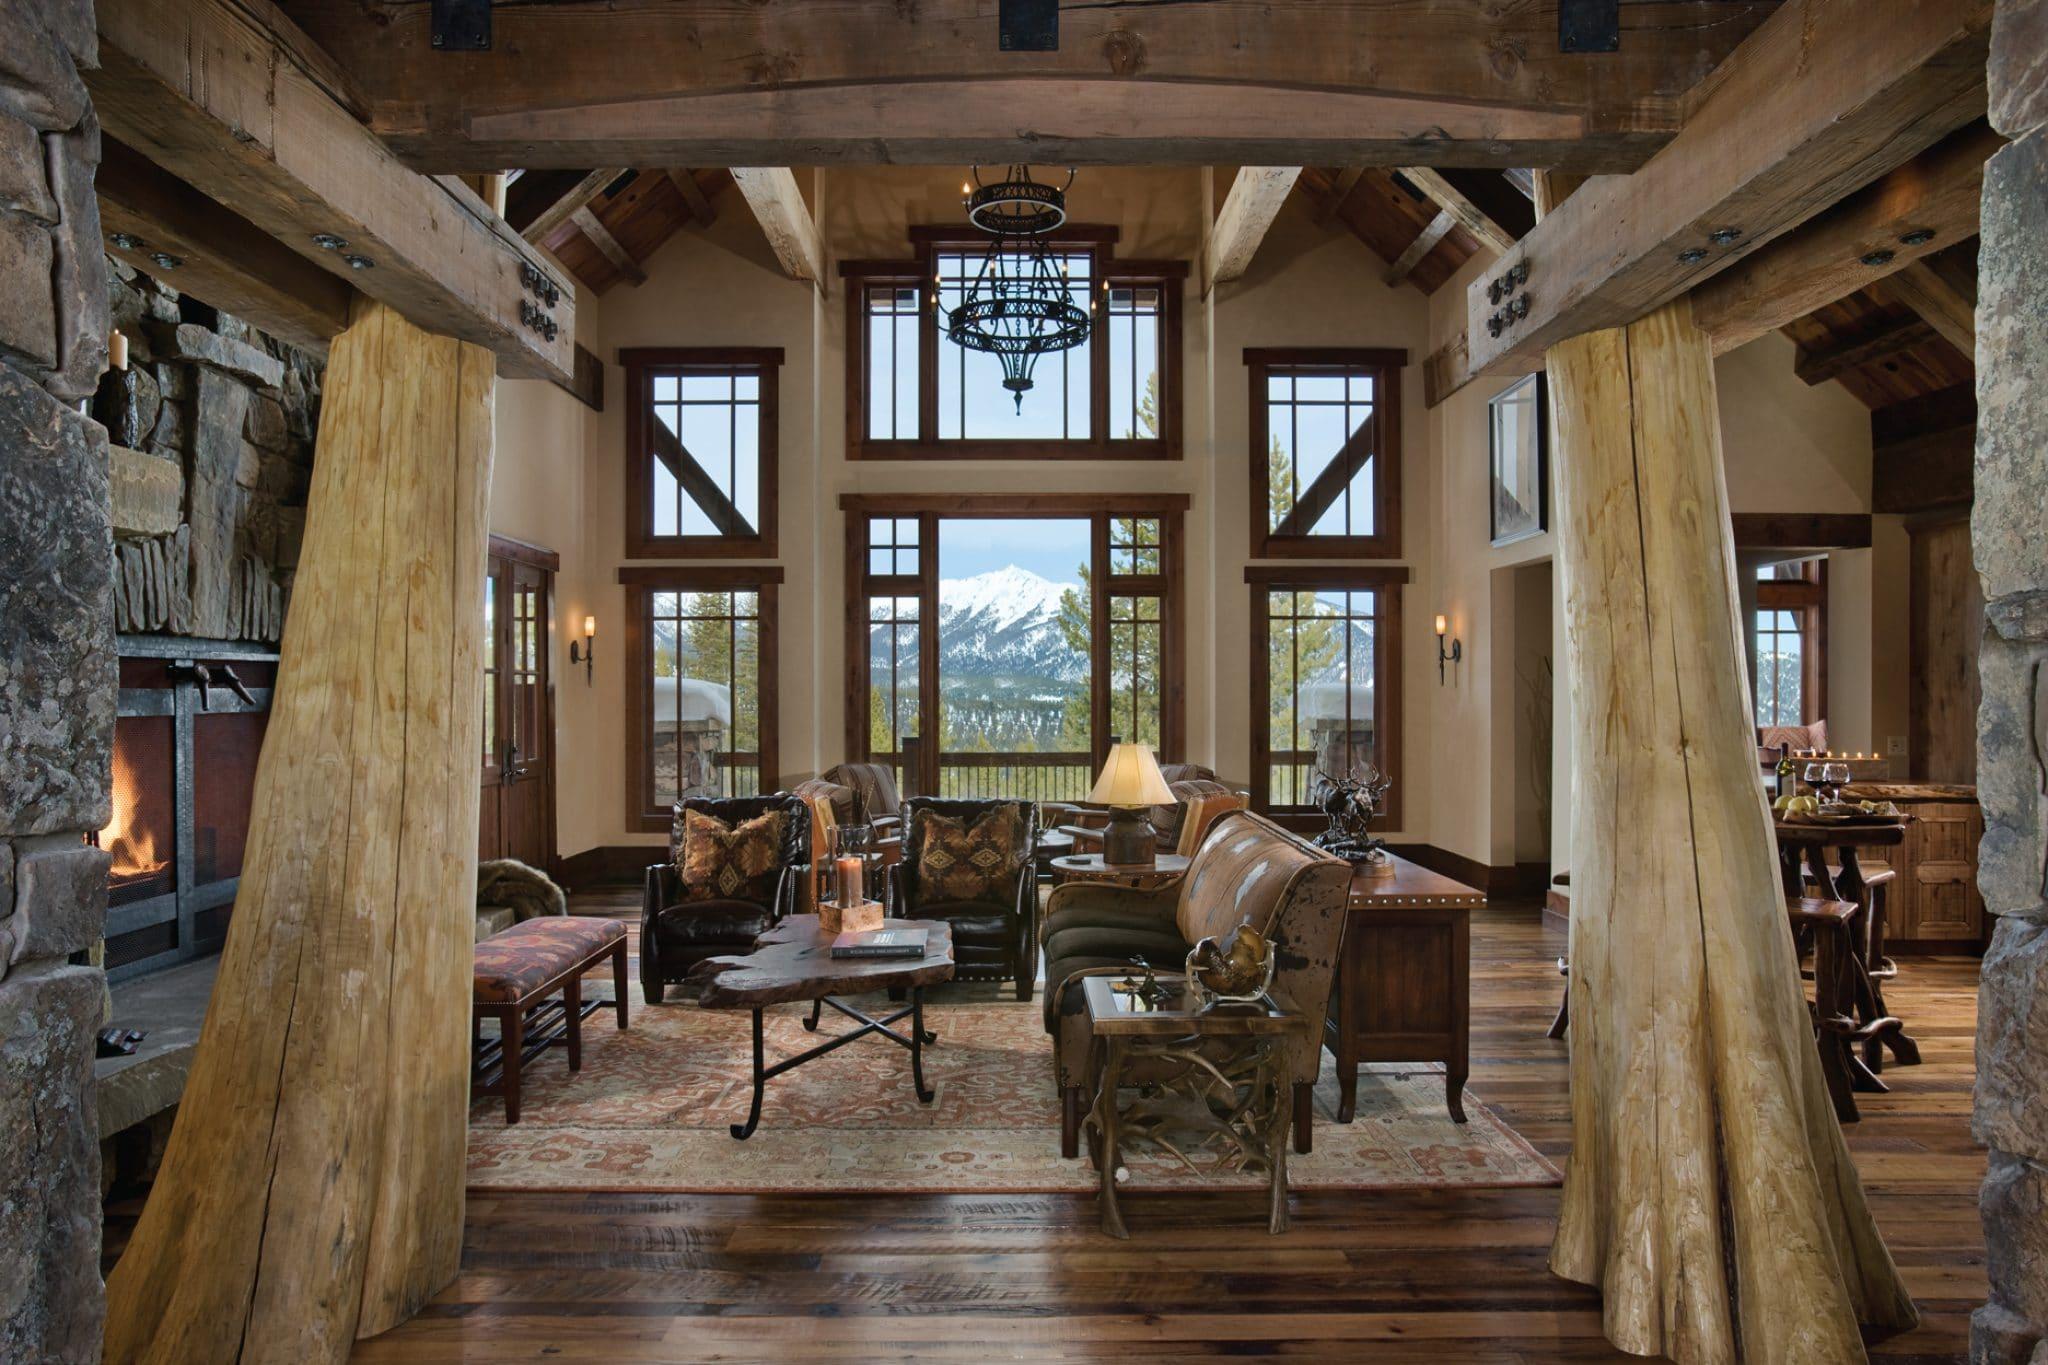 Elk ridge lodge centre sky architecture for Mountain lodge architecture